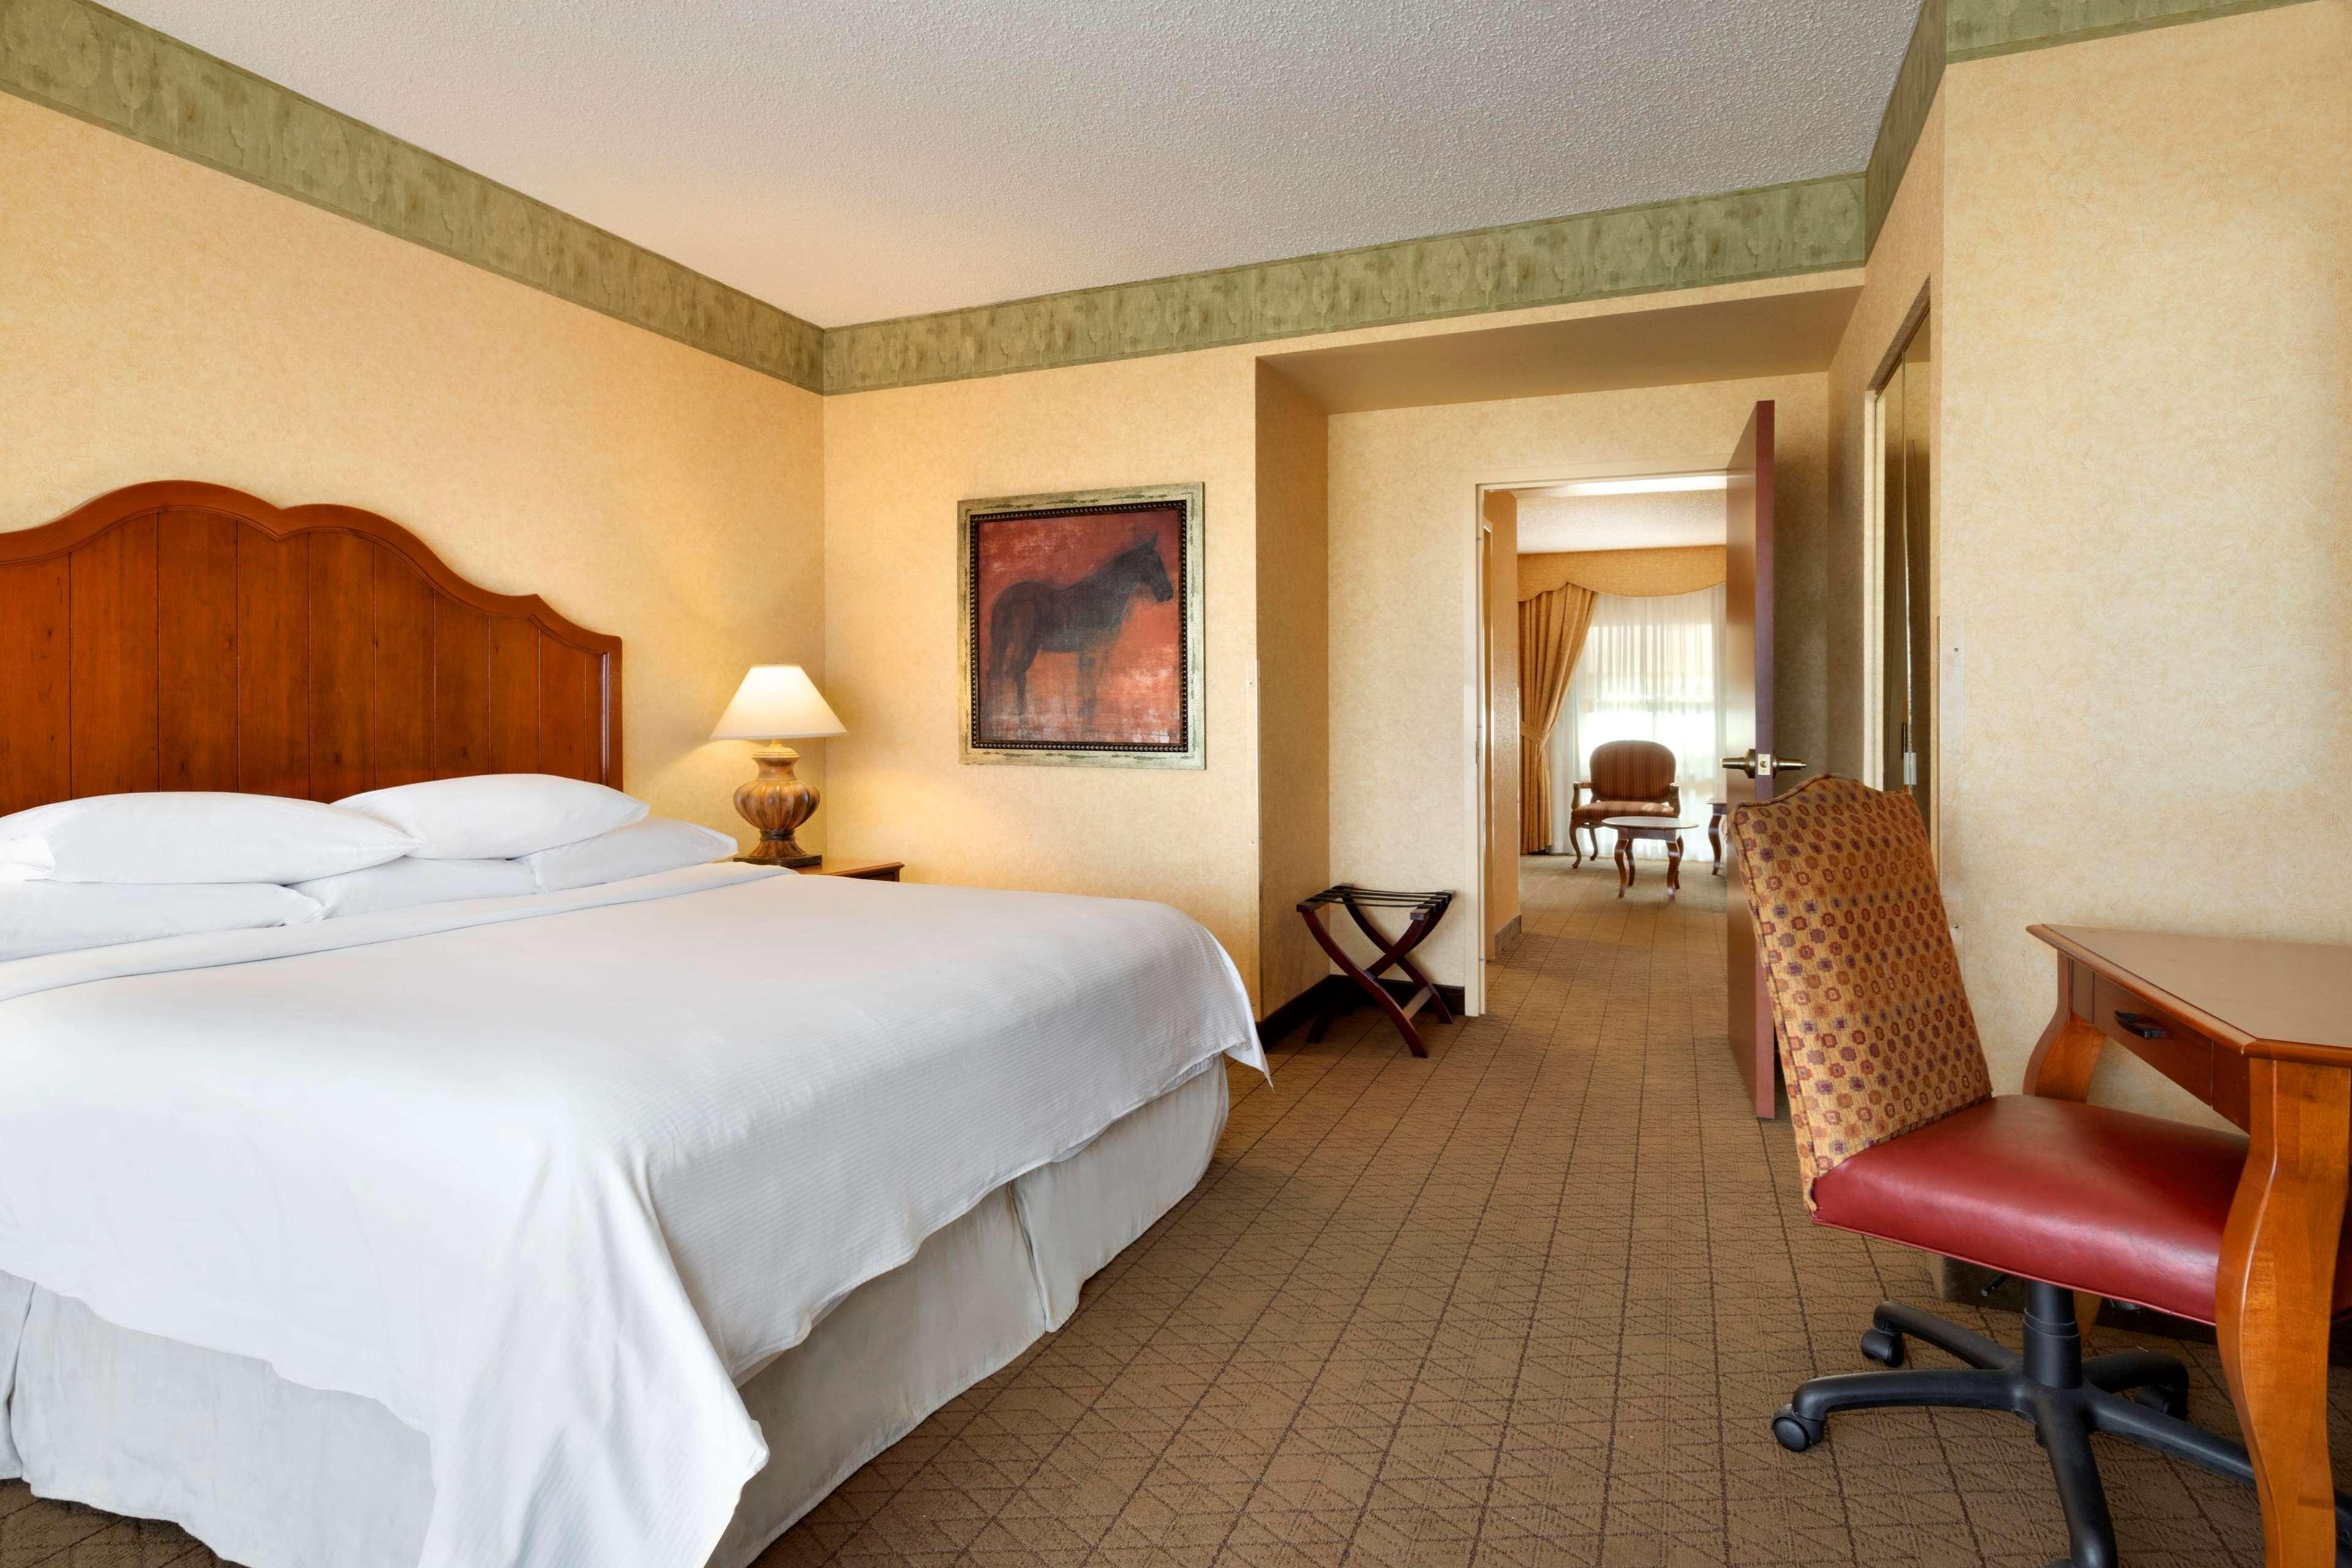 Embassy Suites by Hilton Albuquerque Hotel & Spa image 29